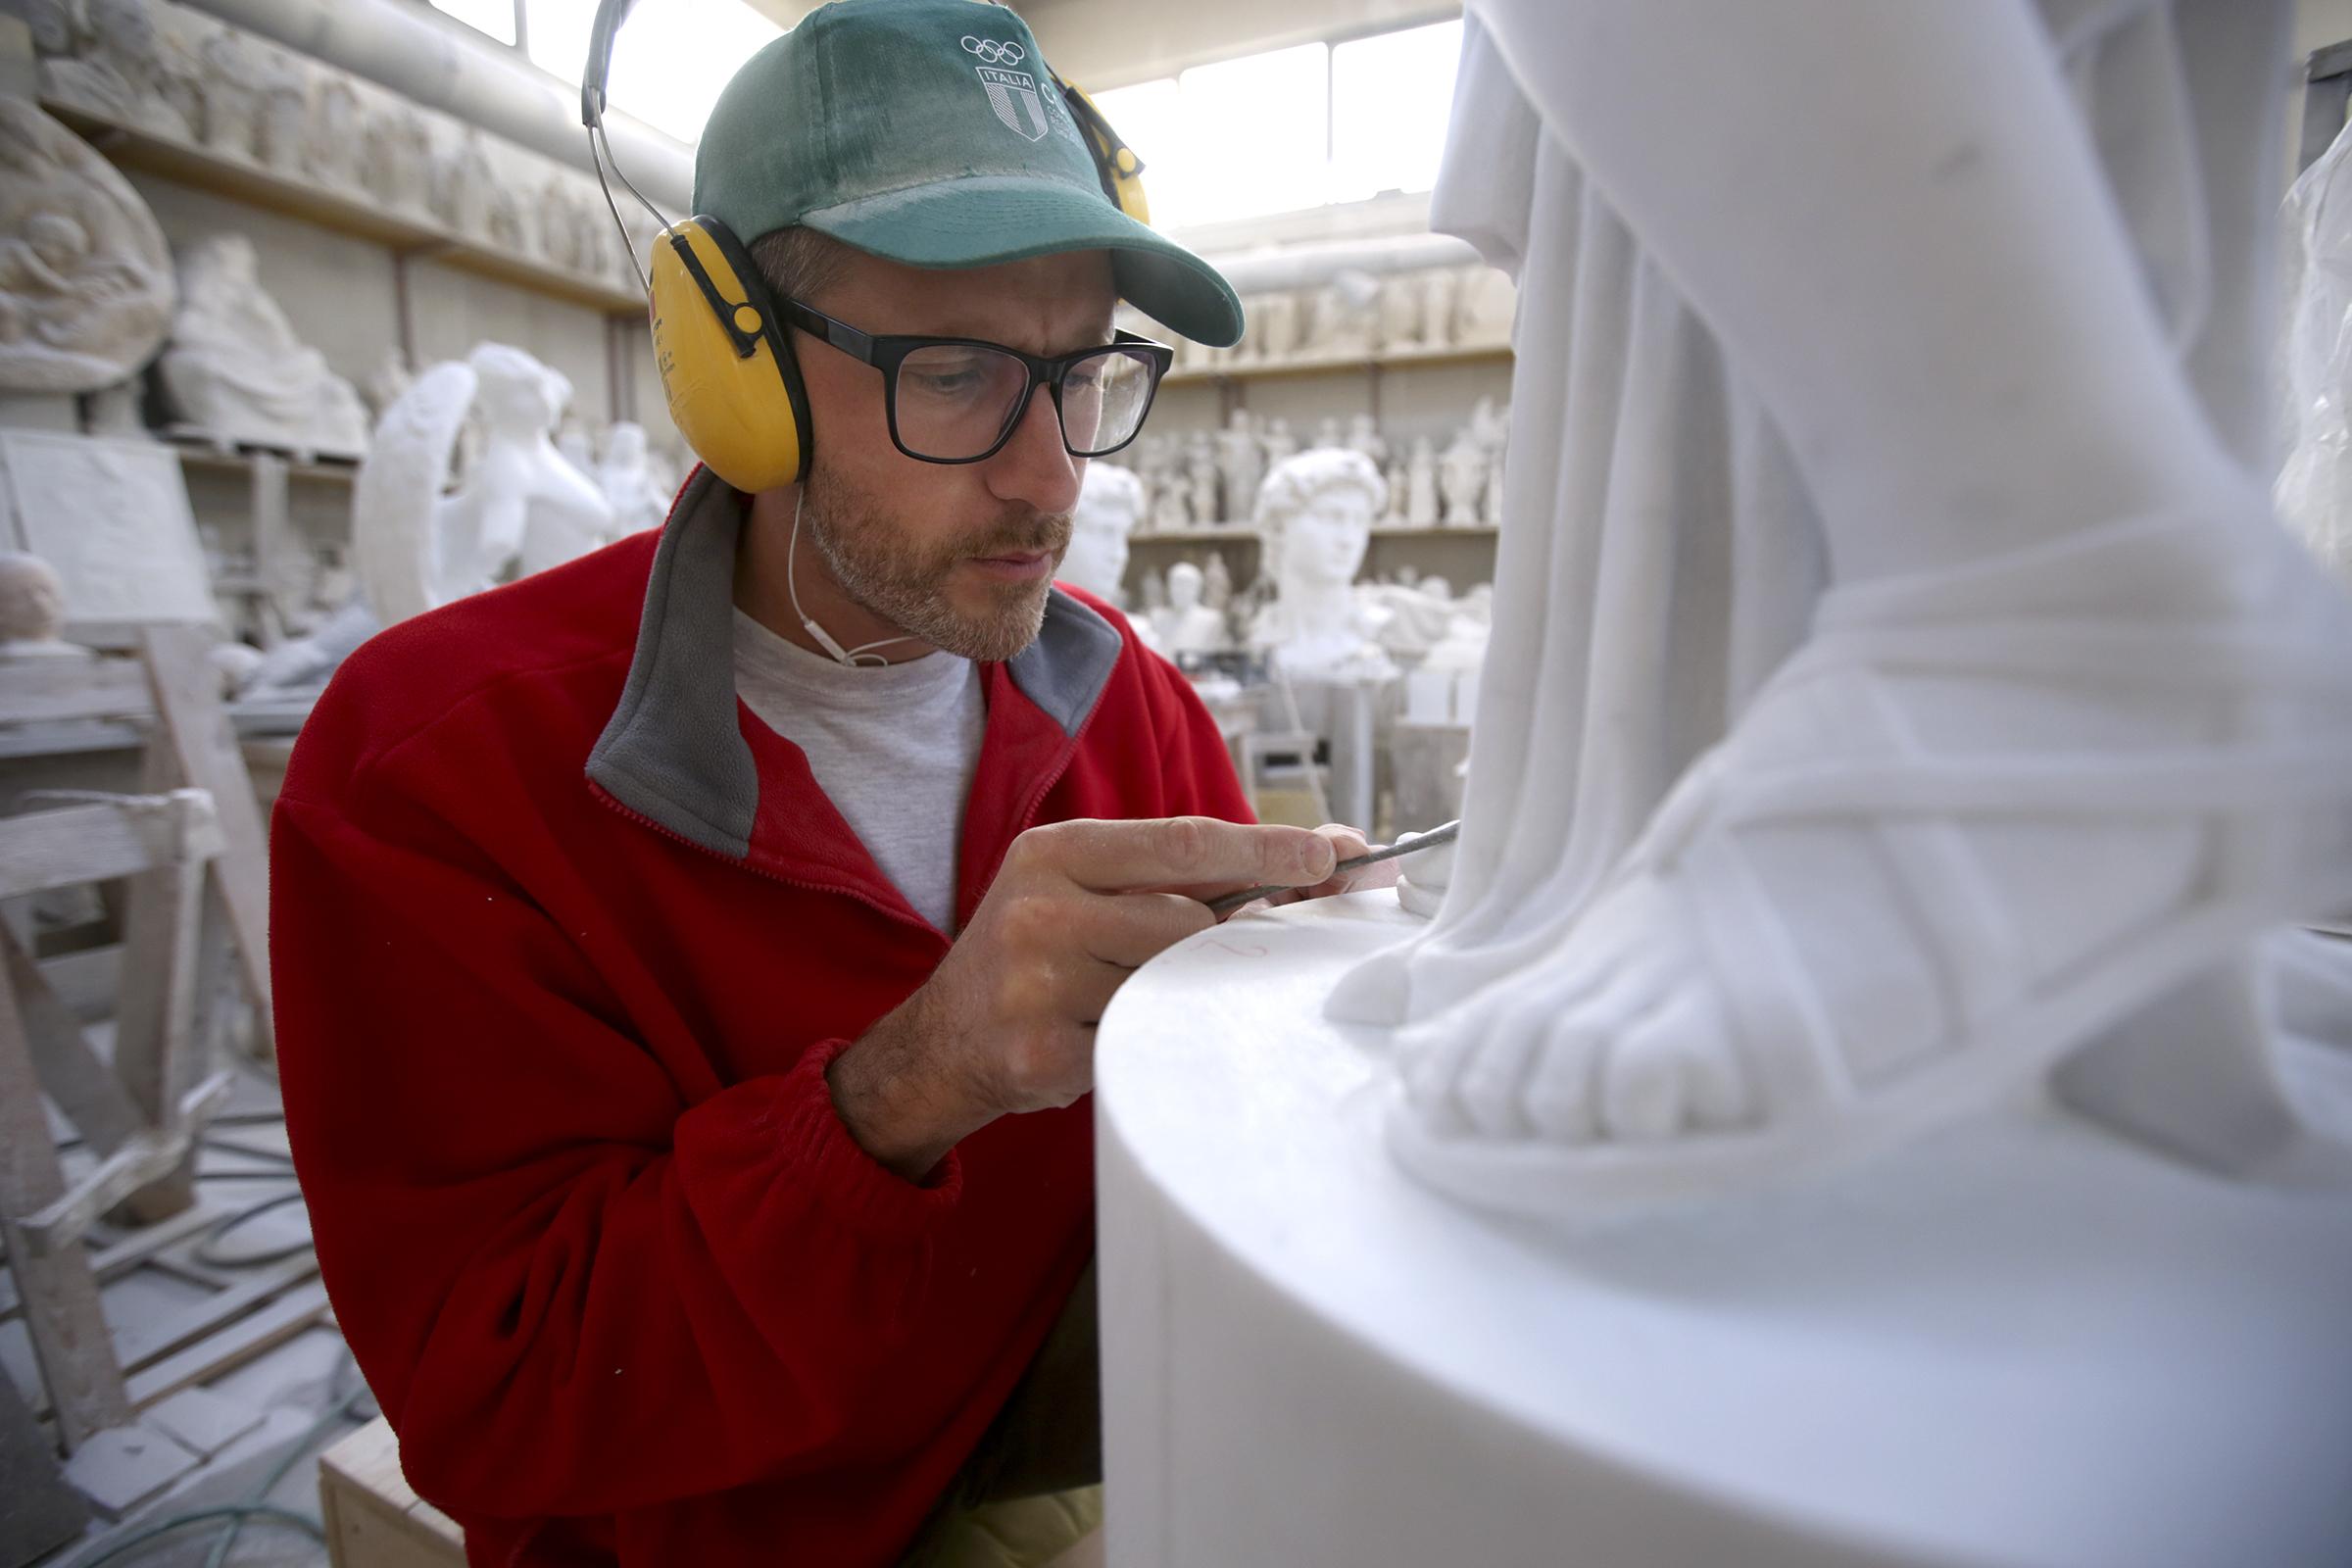 Johannes Felder sculpts a marble statue at the Studi d'Arte Cave Michelangelo in Carrara, Italy, on Thursday, Nov. 15, 2018.